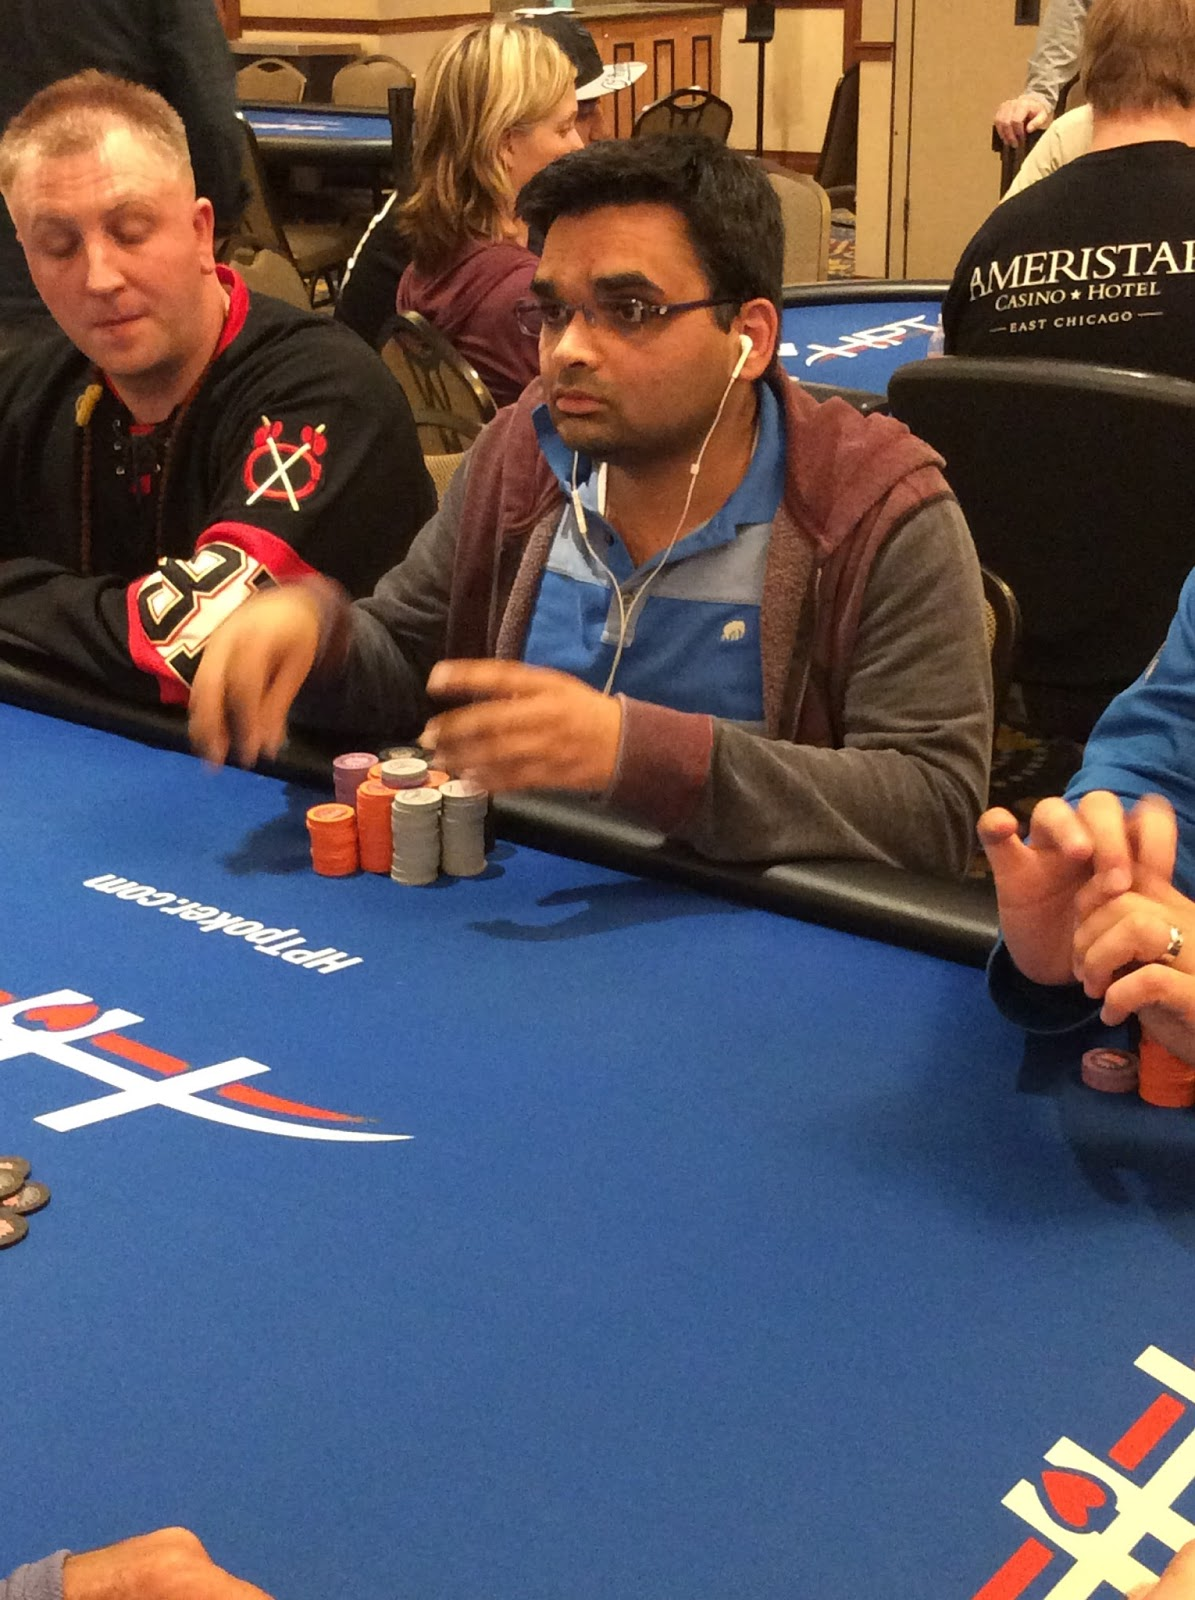 Heartland poker tour soaring eagle h10 casino playa de las americas